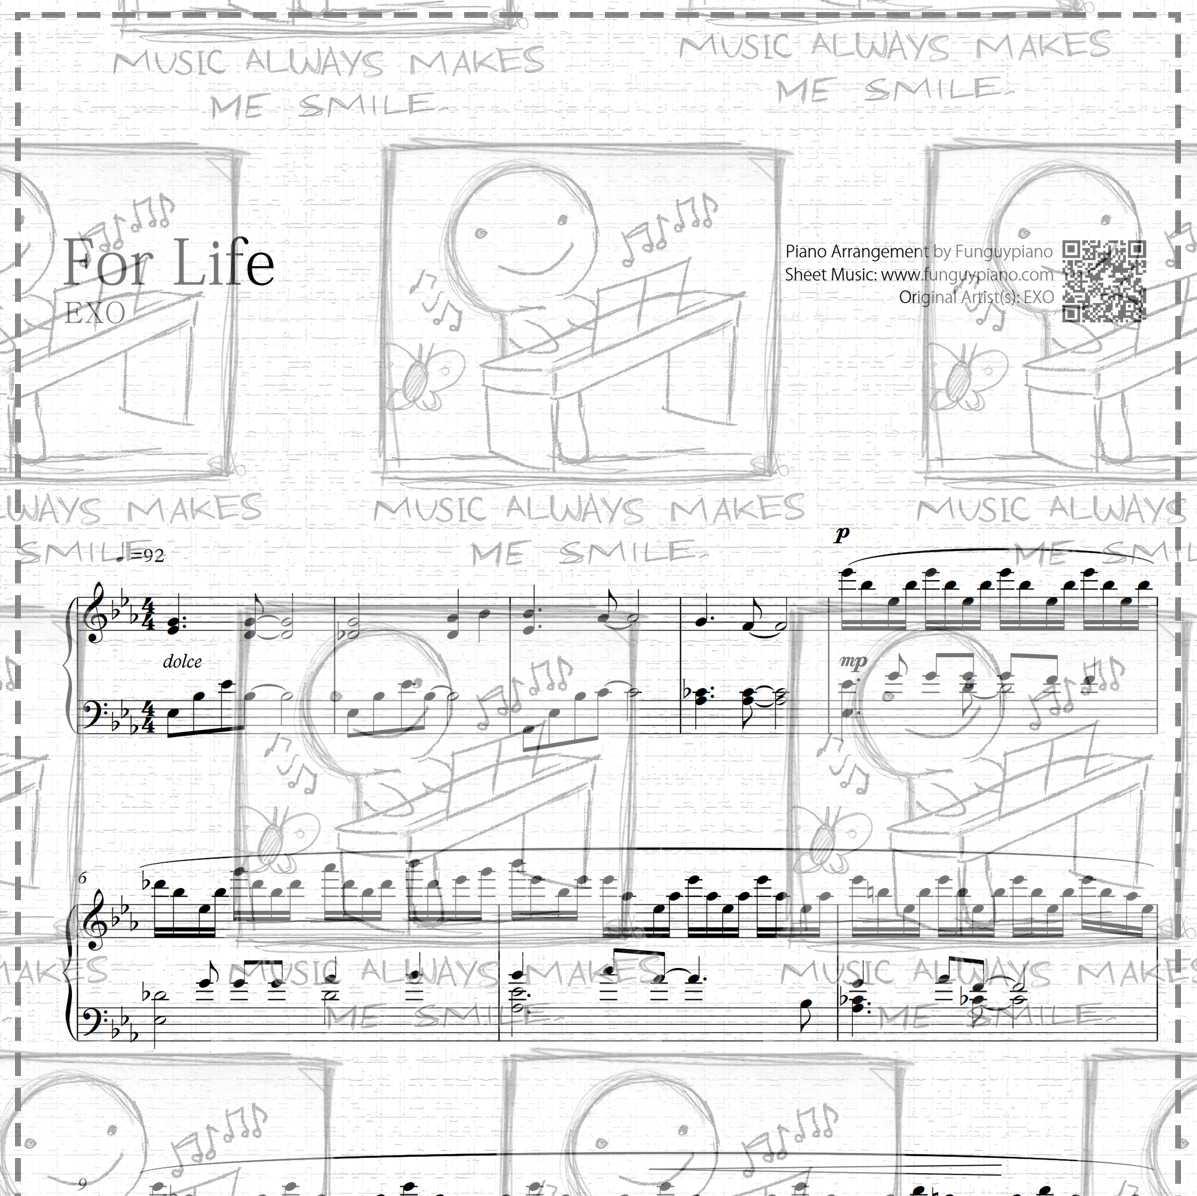 Piano Sheet Music Midi: EXO - For Life [ Sheet Music / Midi / Mp3 ]